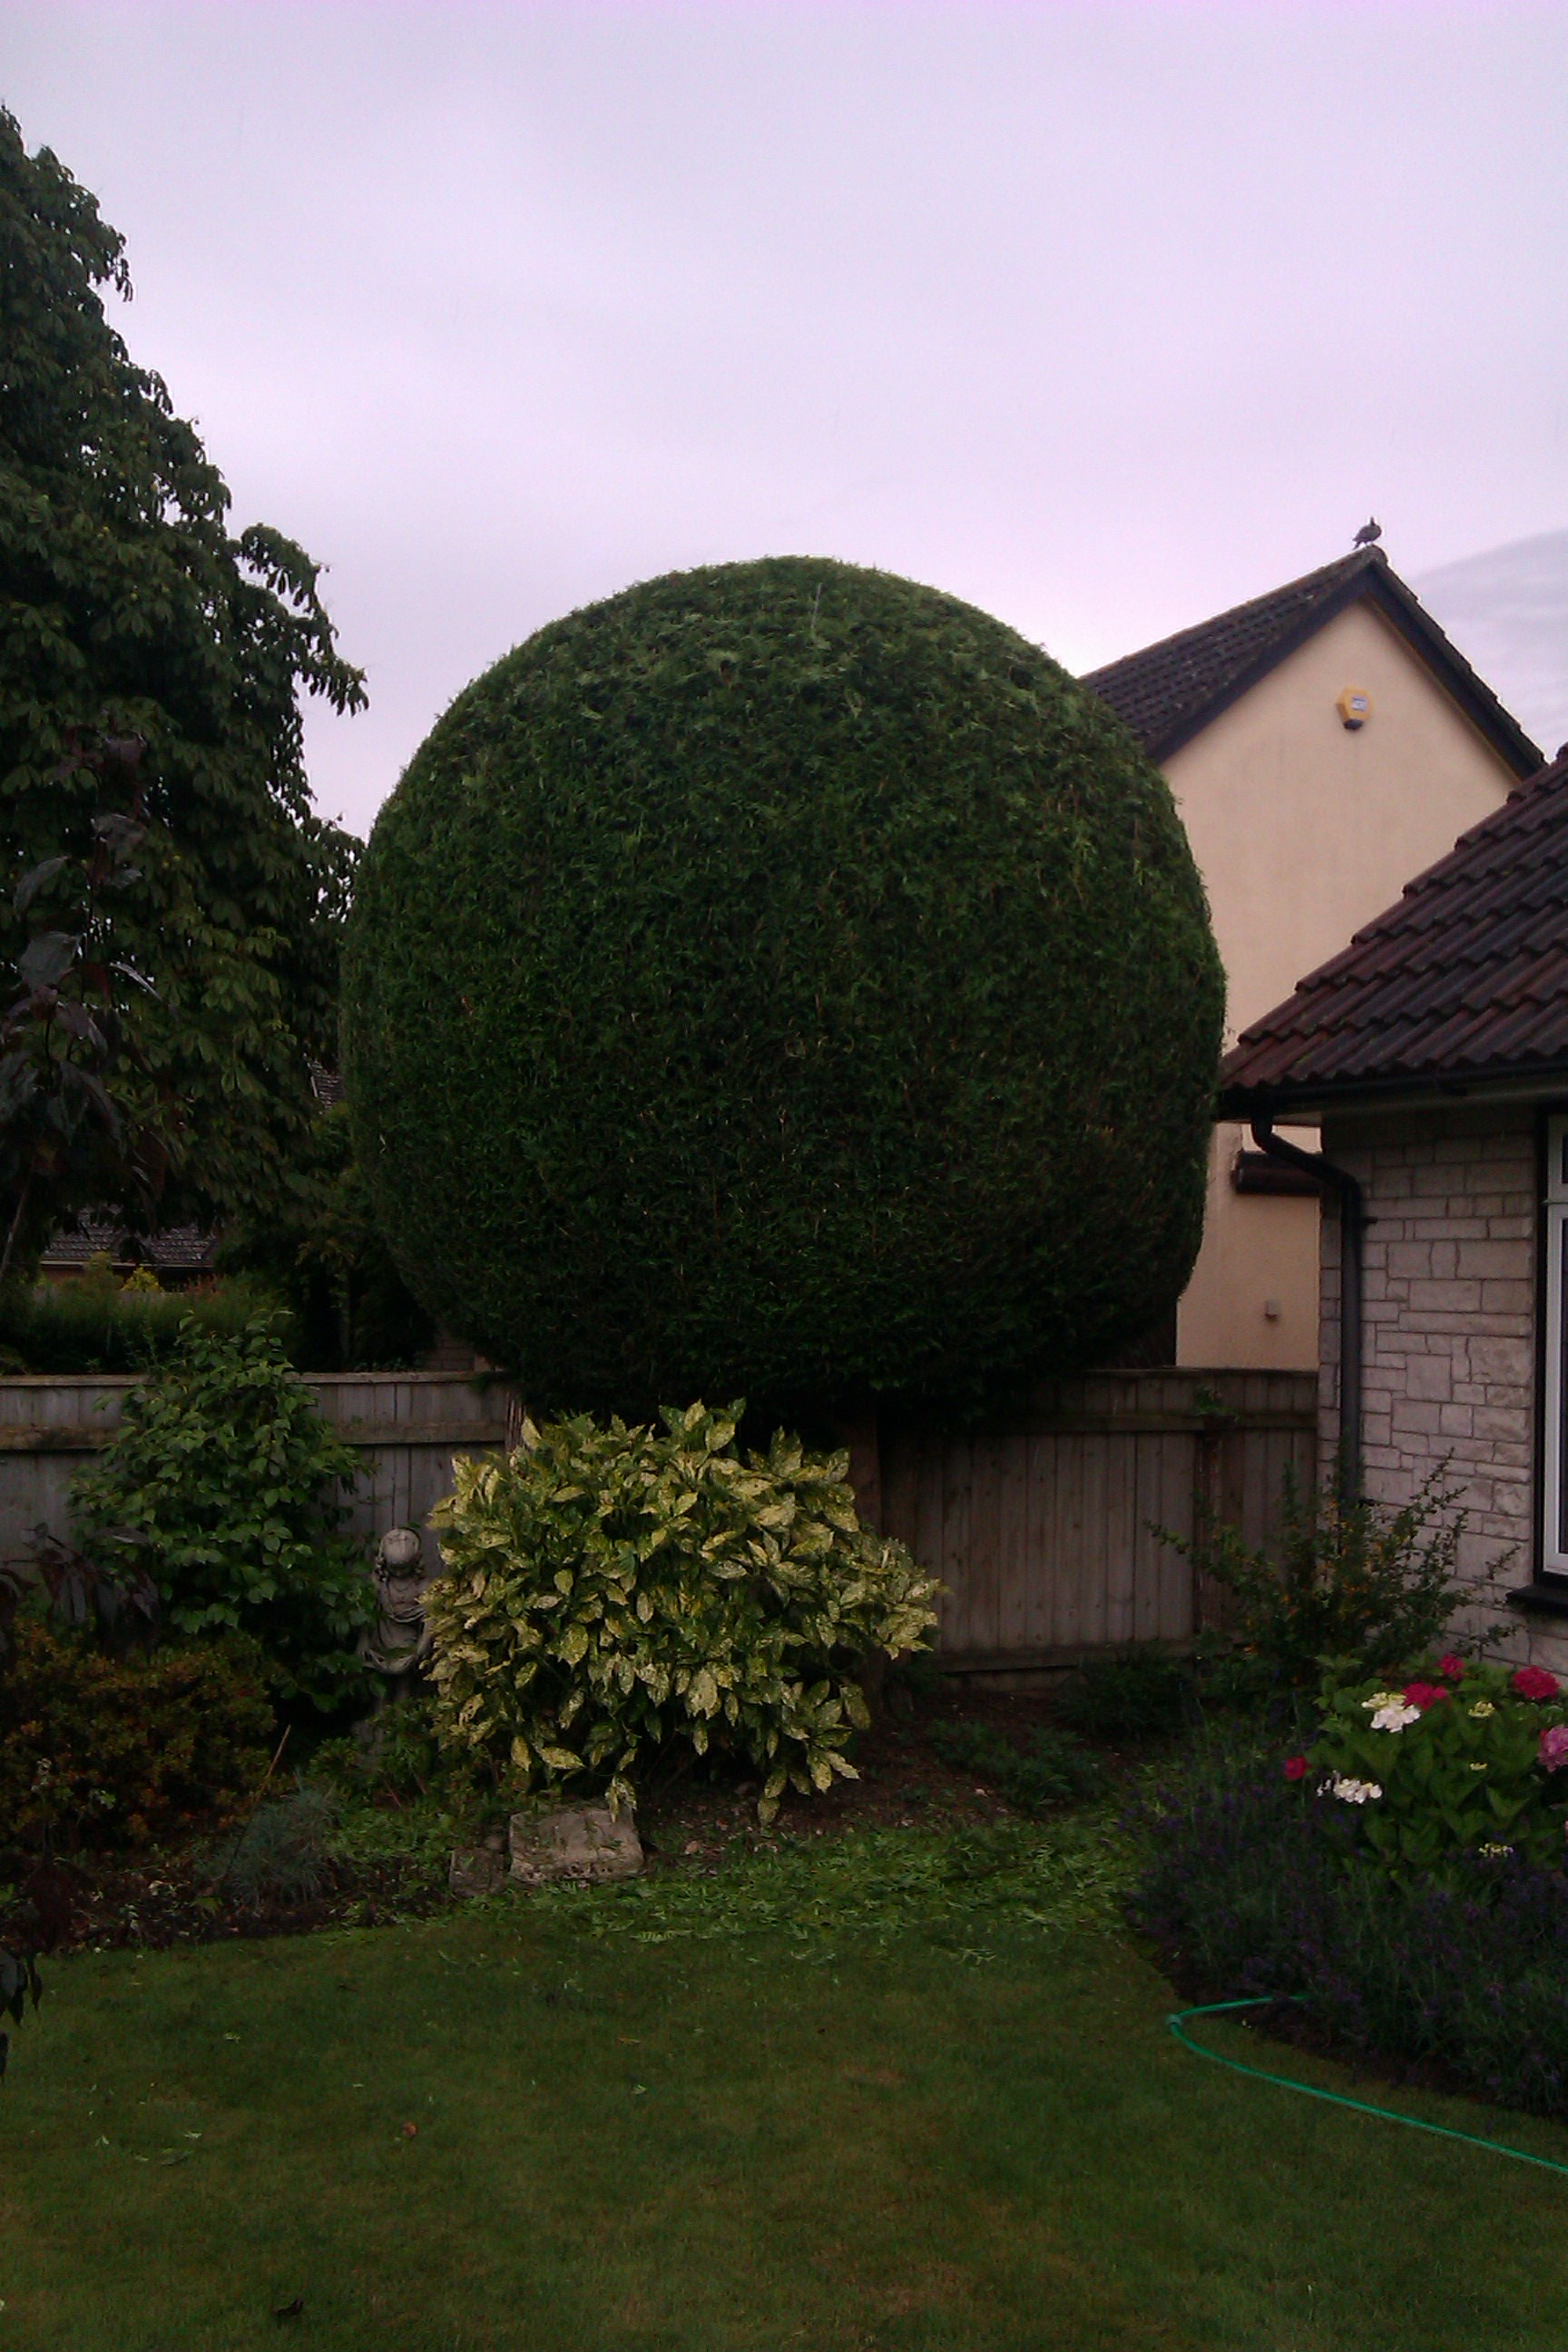 Topiary in Dorset